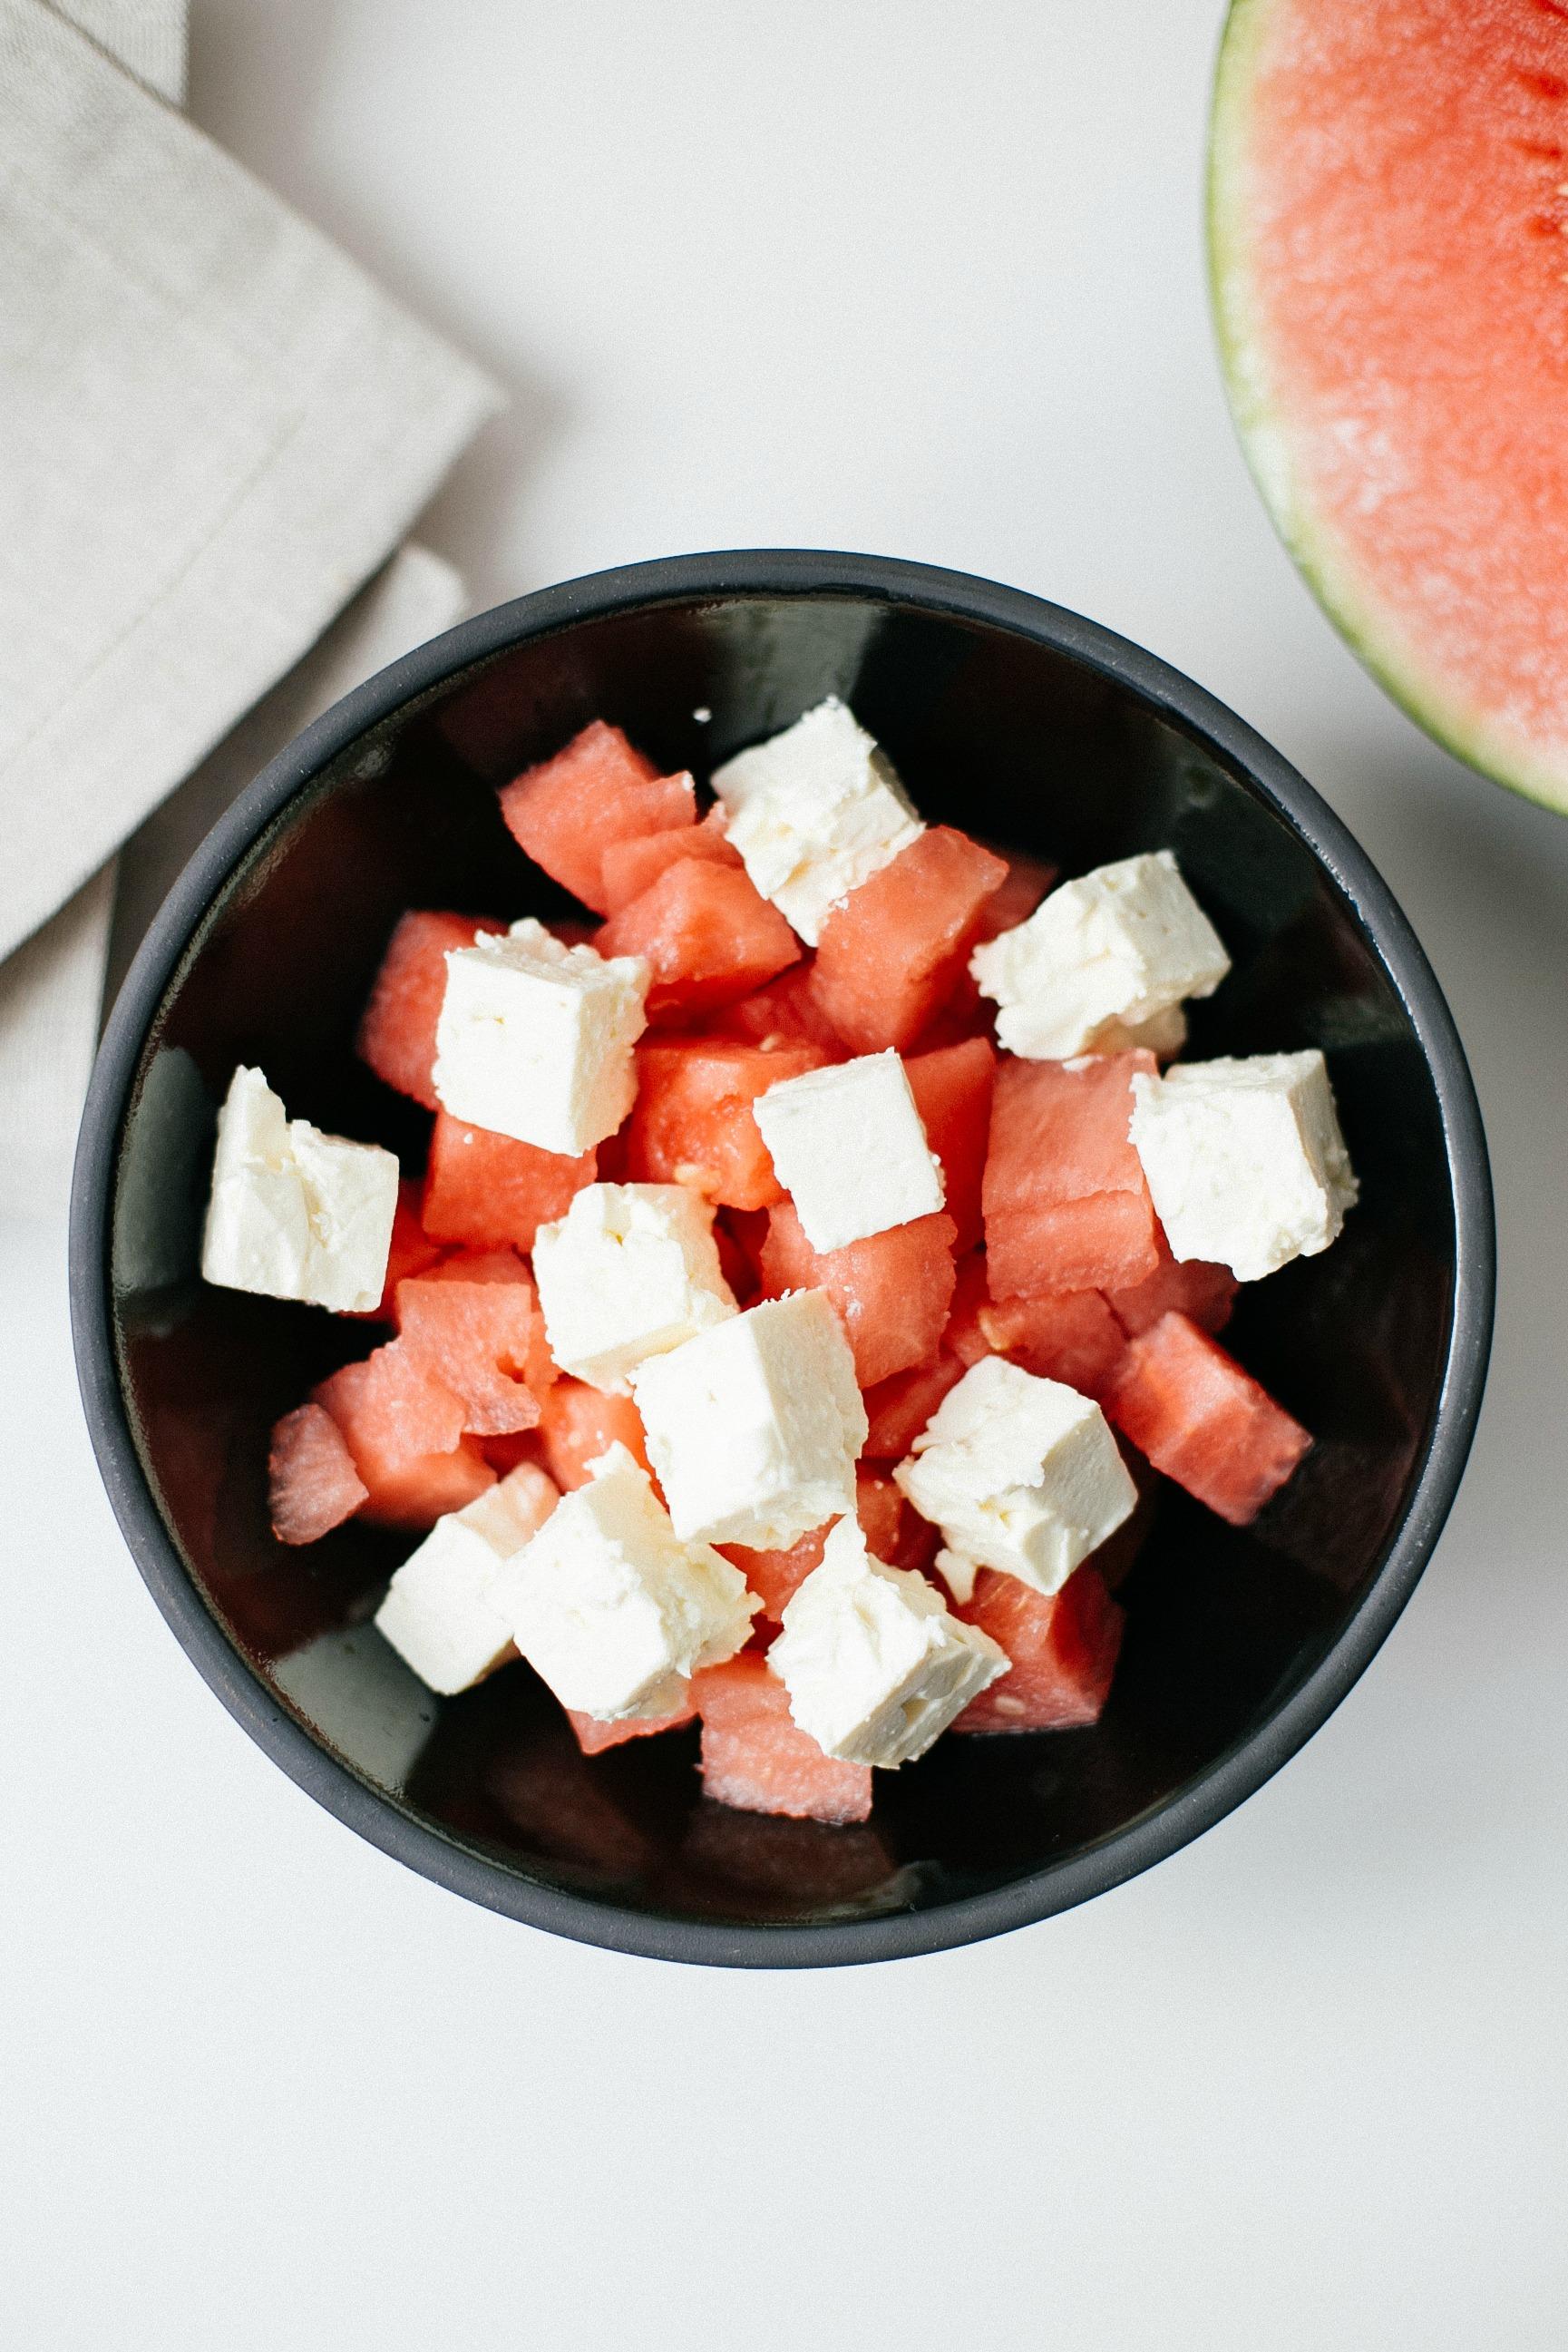 disi-couture-watermelon-avocado-summer-salad-fresh-easy-01